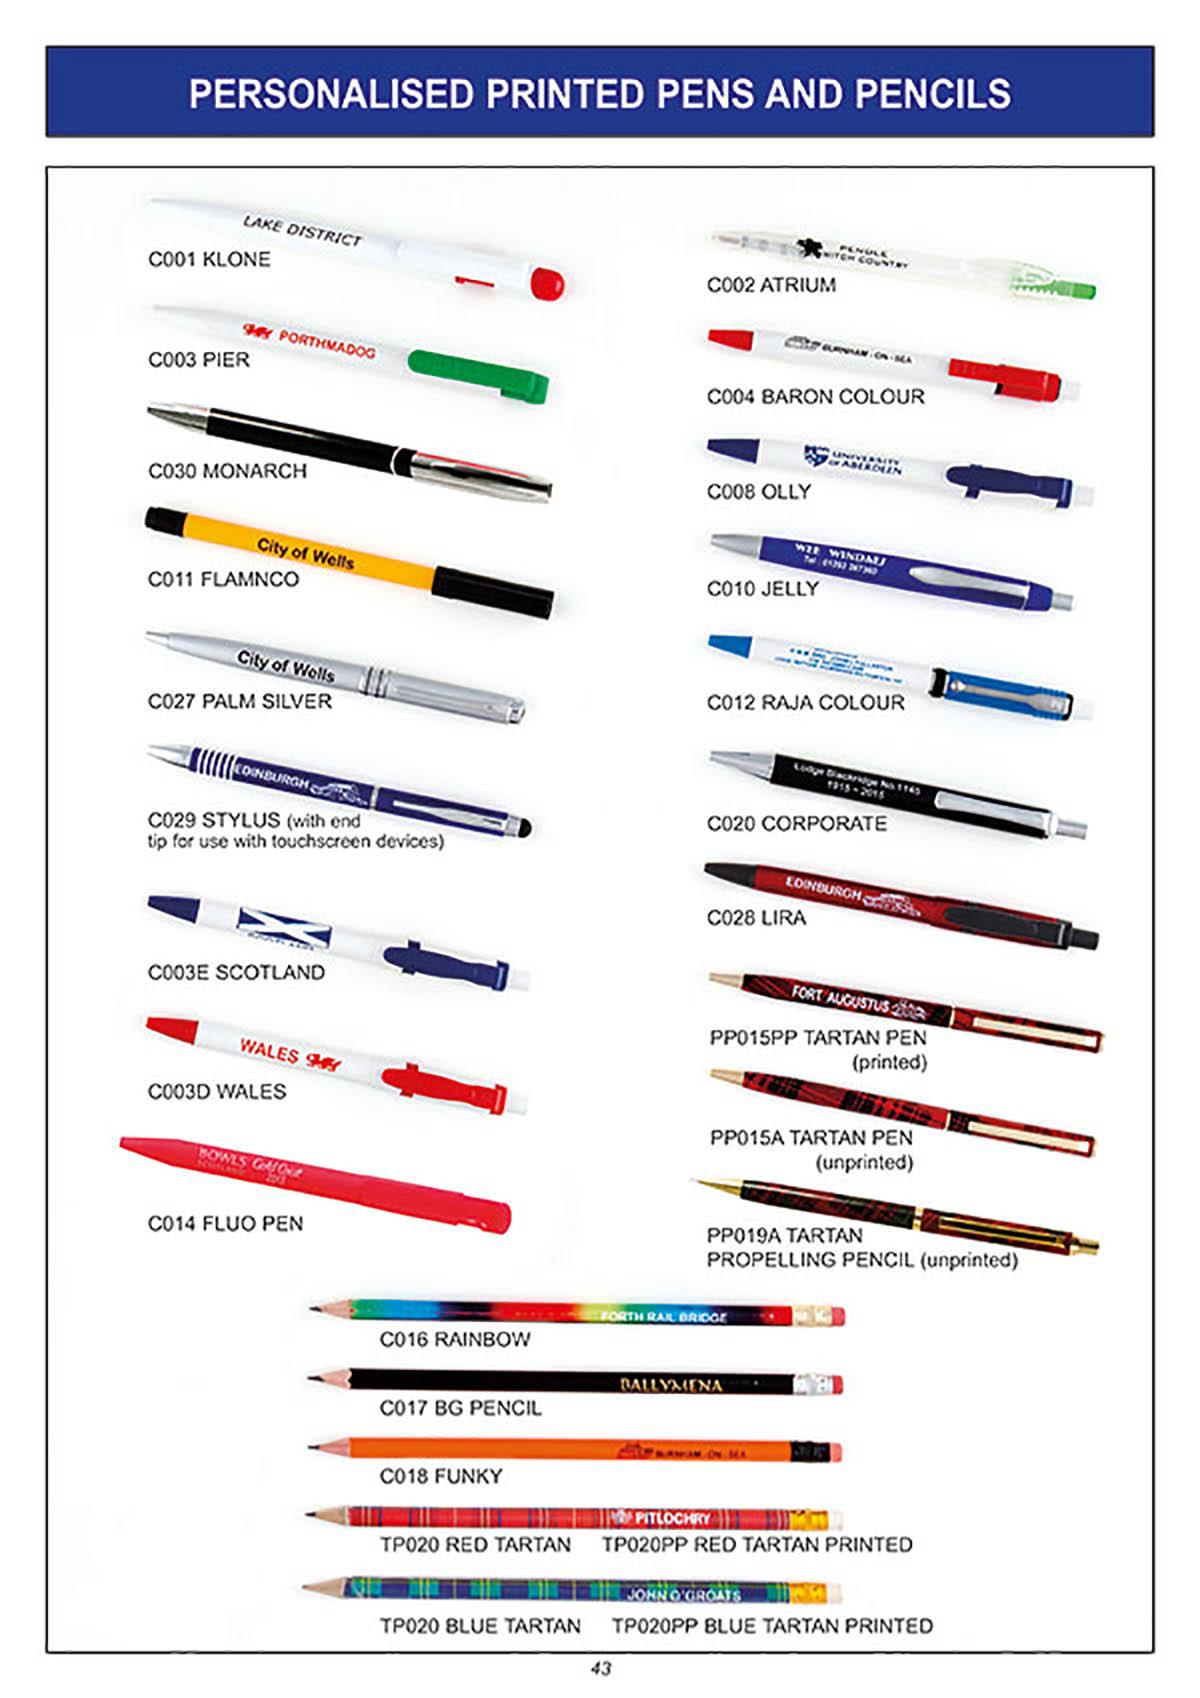 personalised printed pens pencils